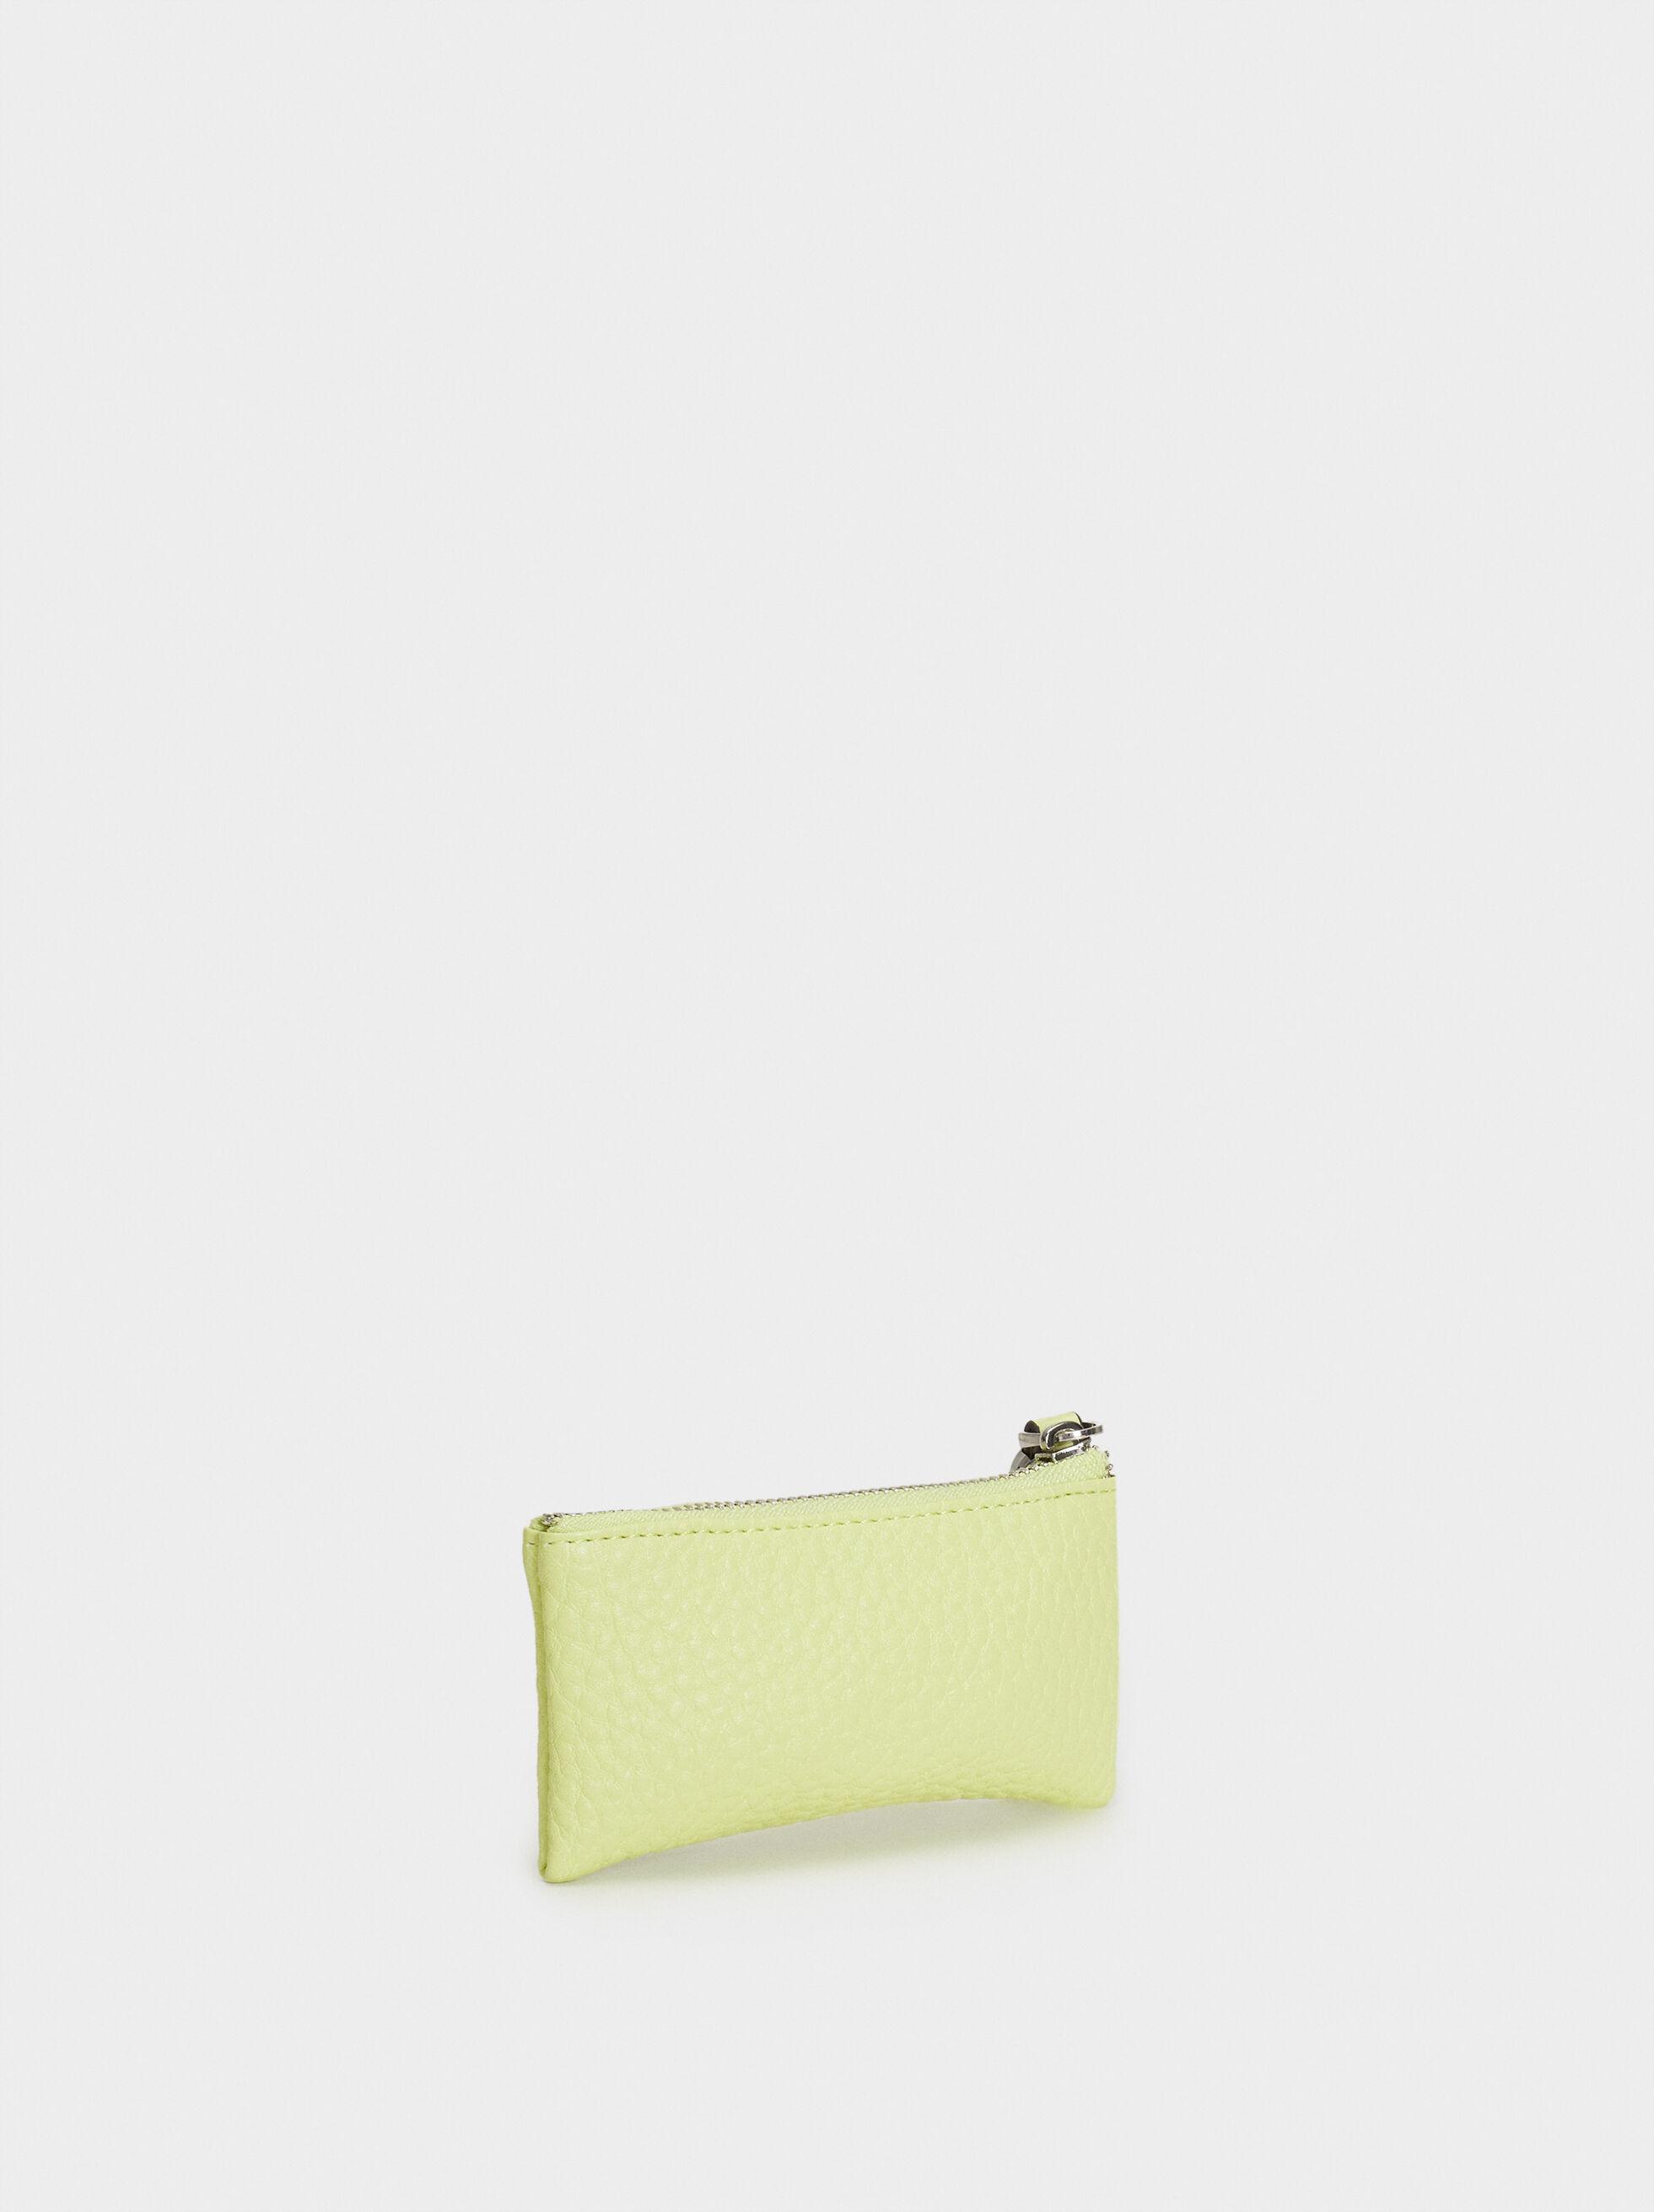 Medium Purse With Key Ring, Yellow, hi-res